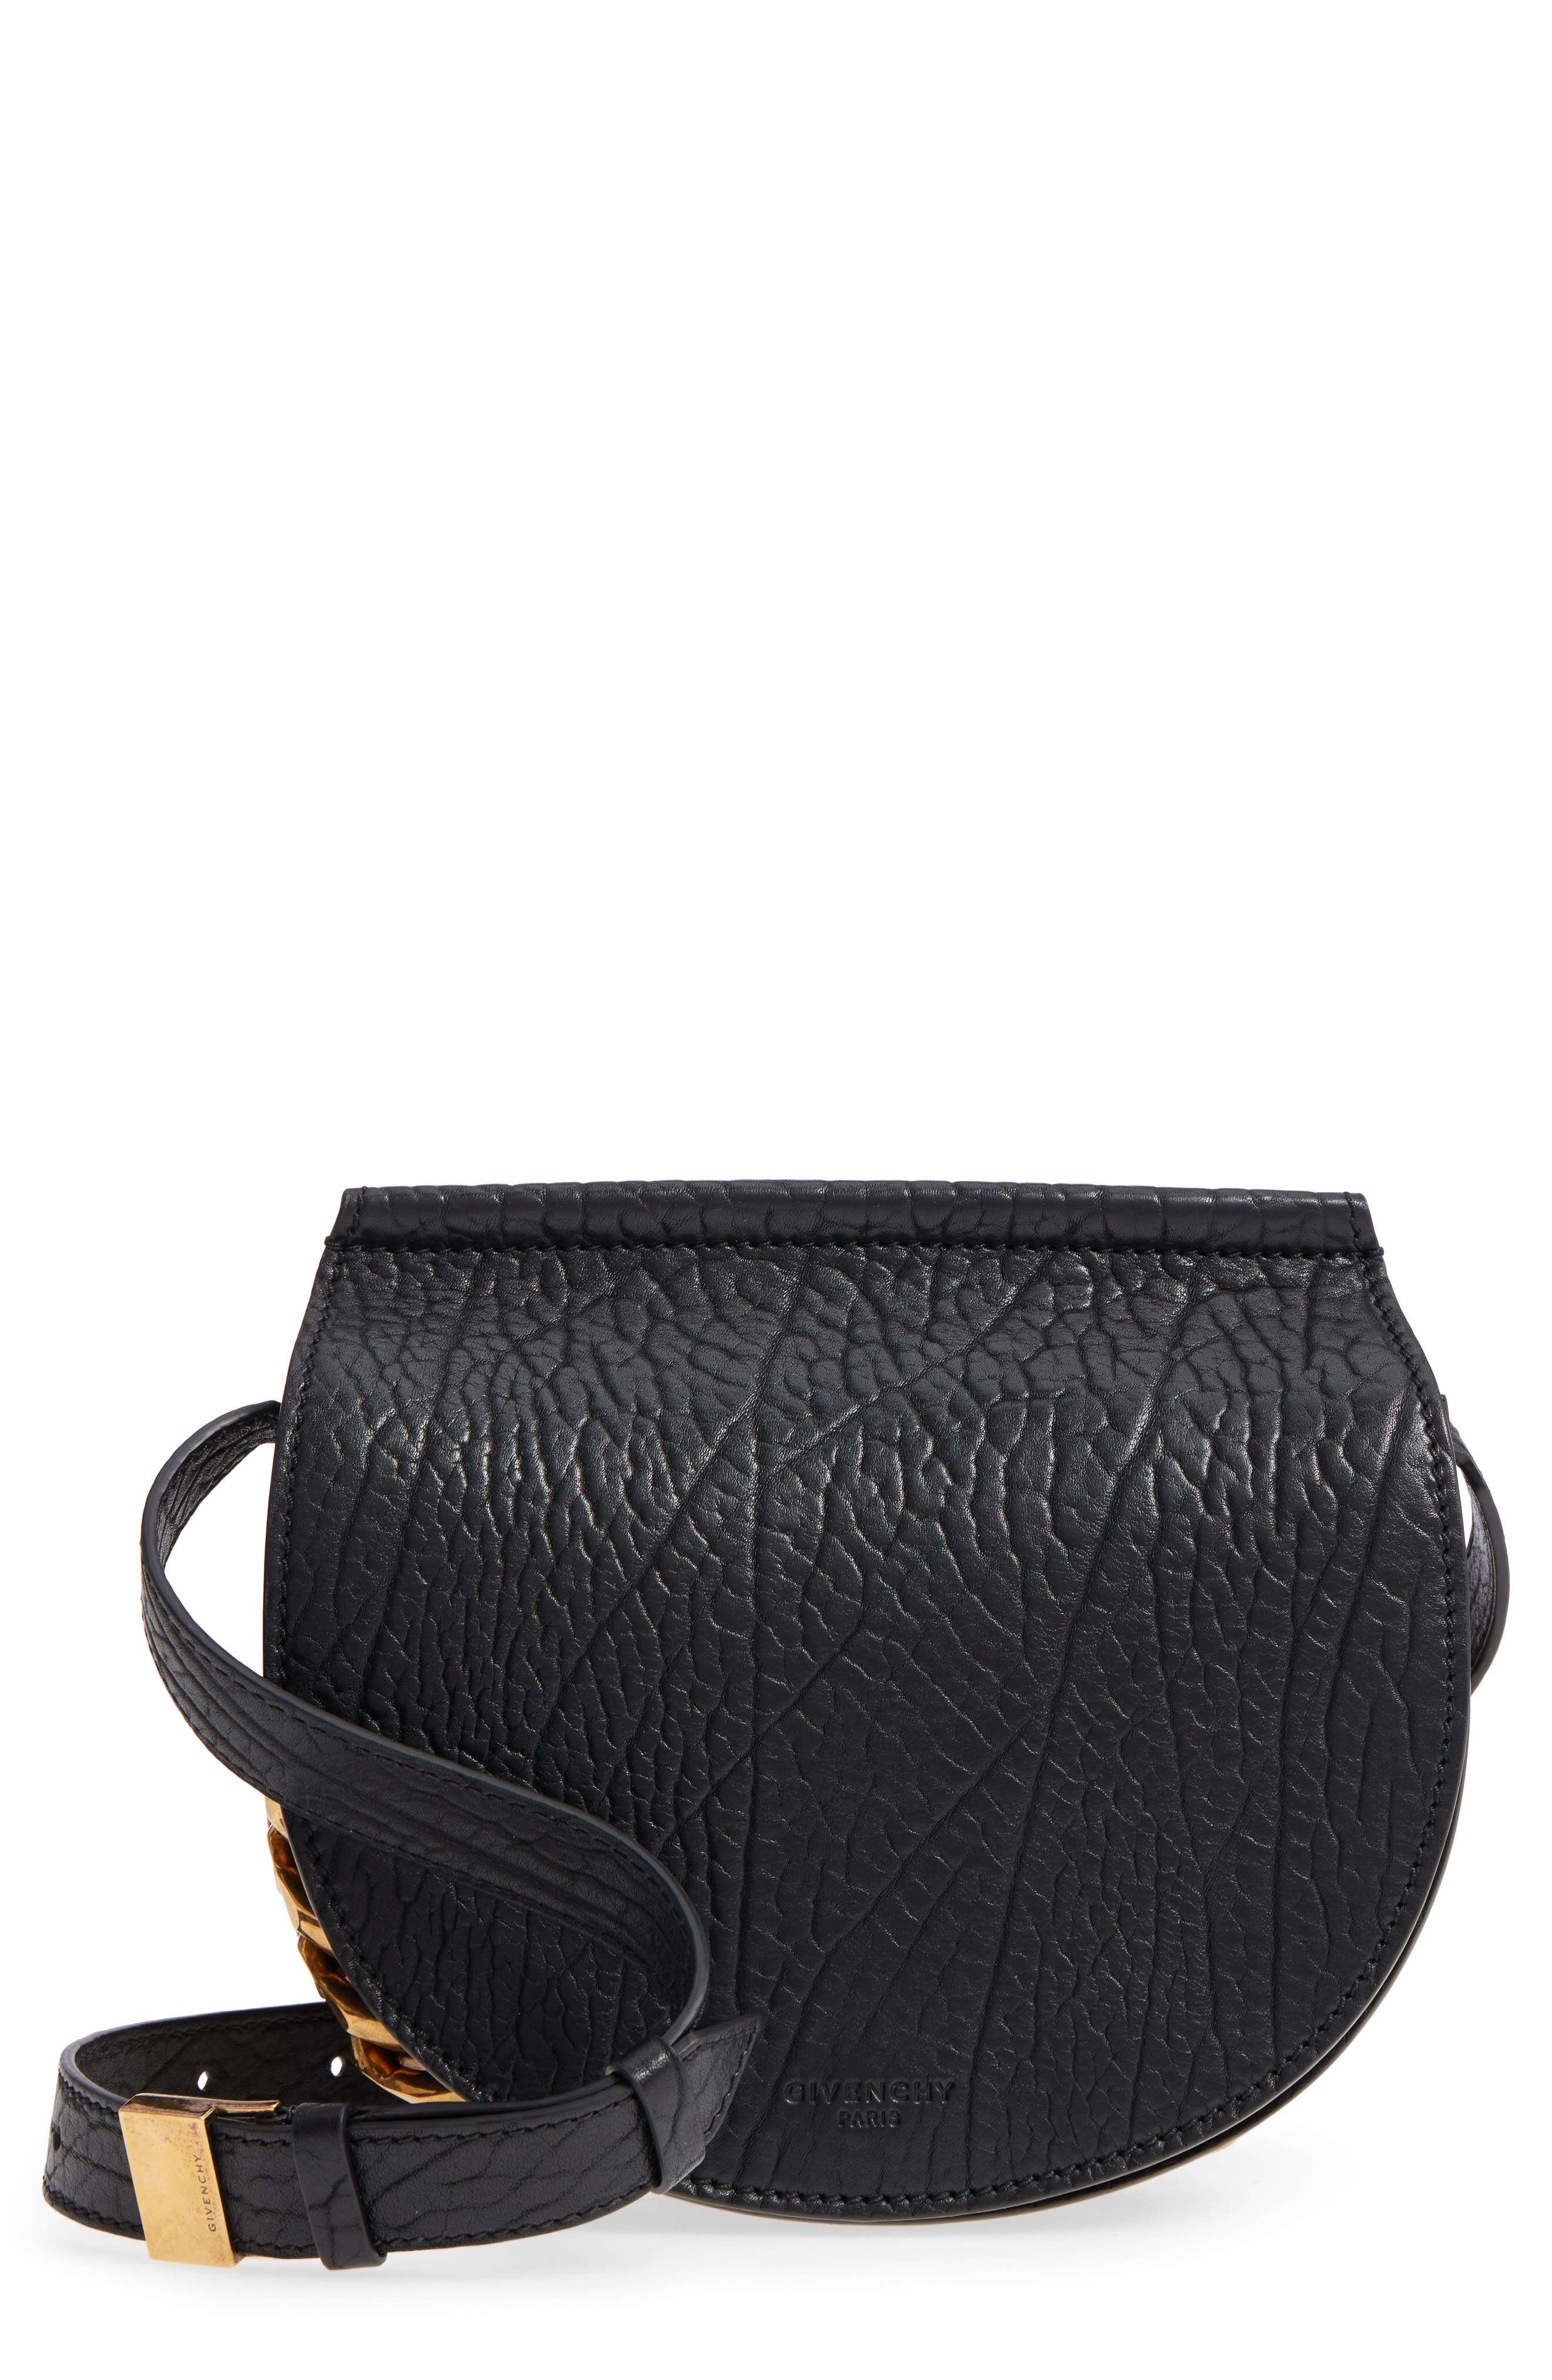 Infinity Calfskin Leather Saddle Bag,                         Main,                         color, Black